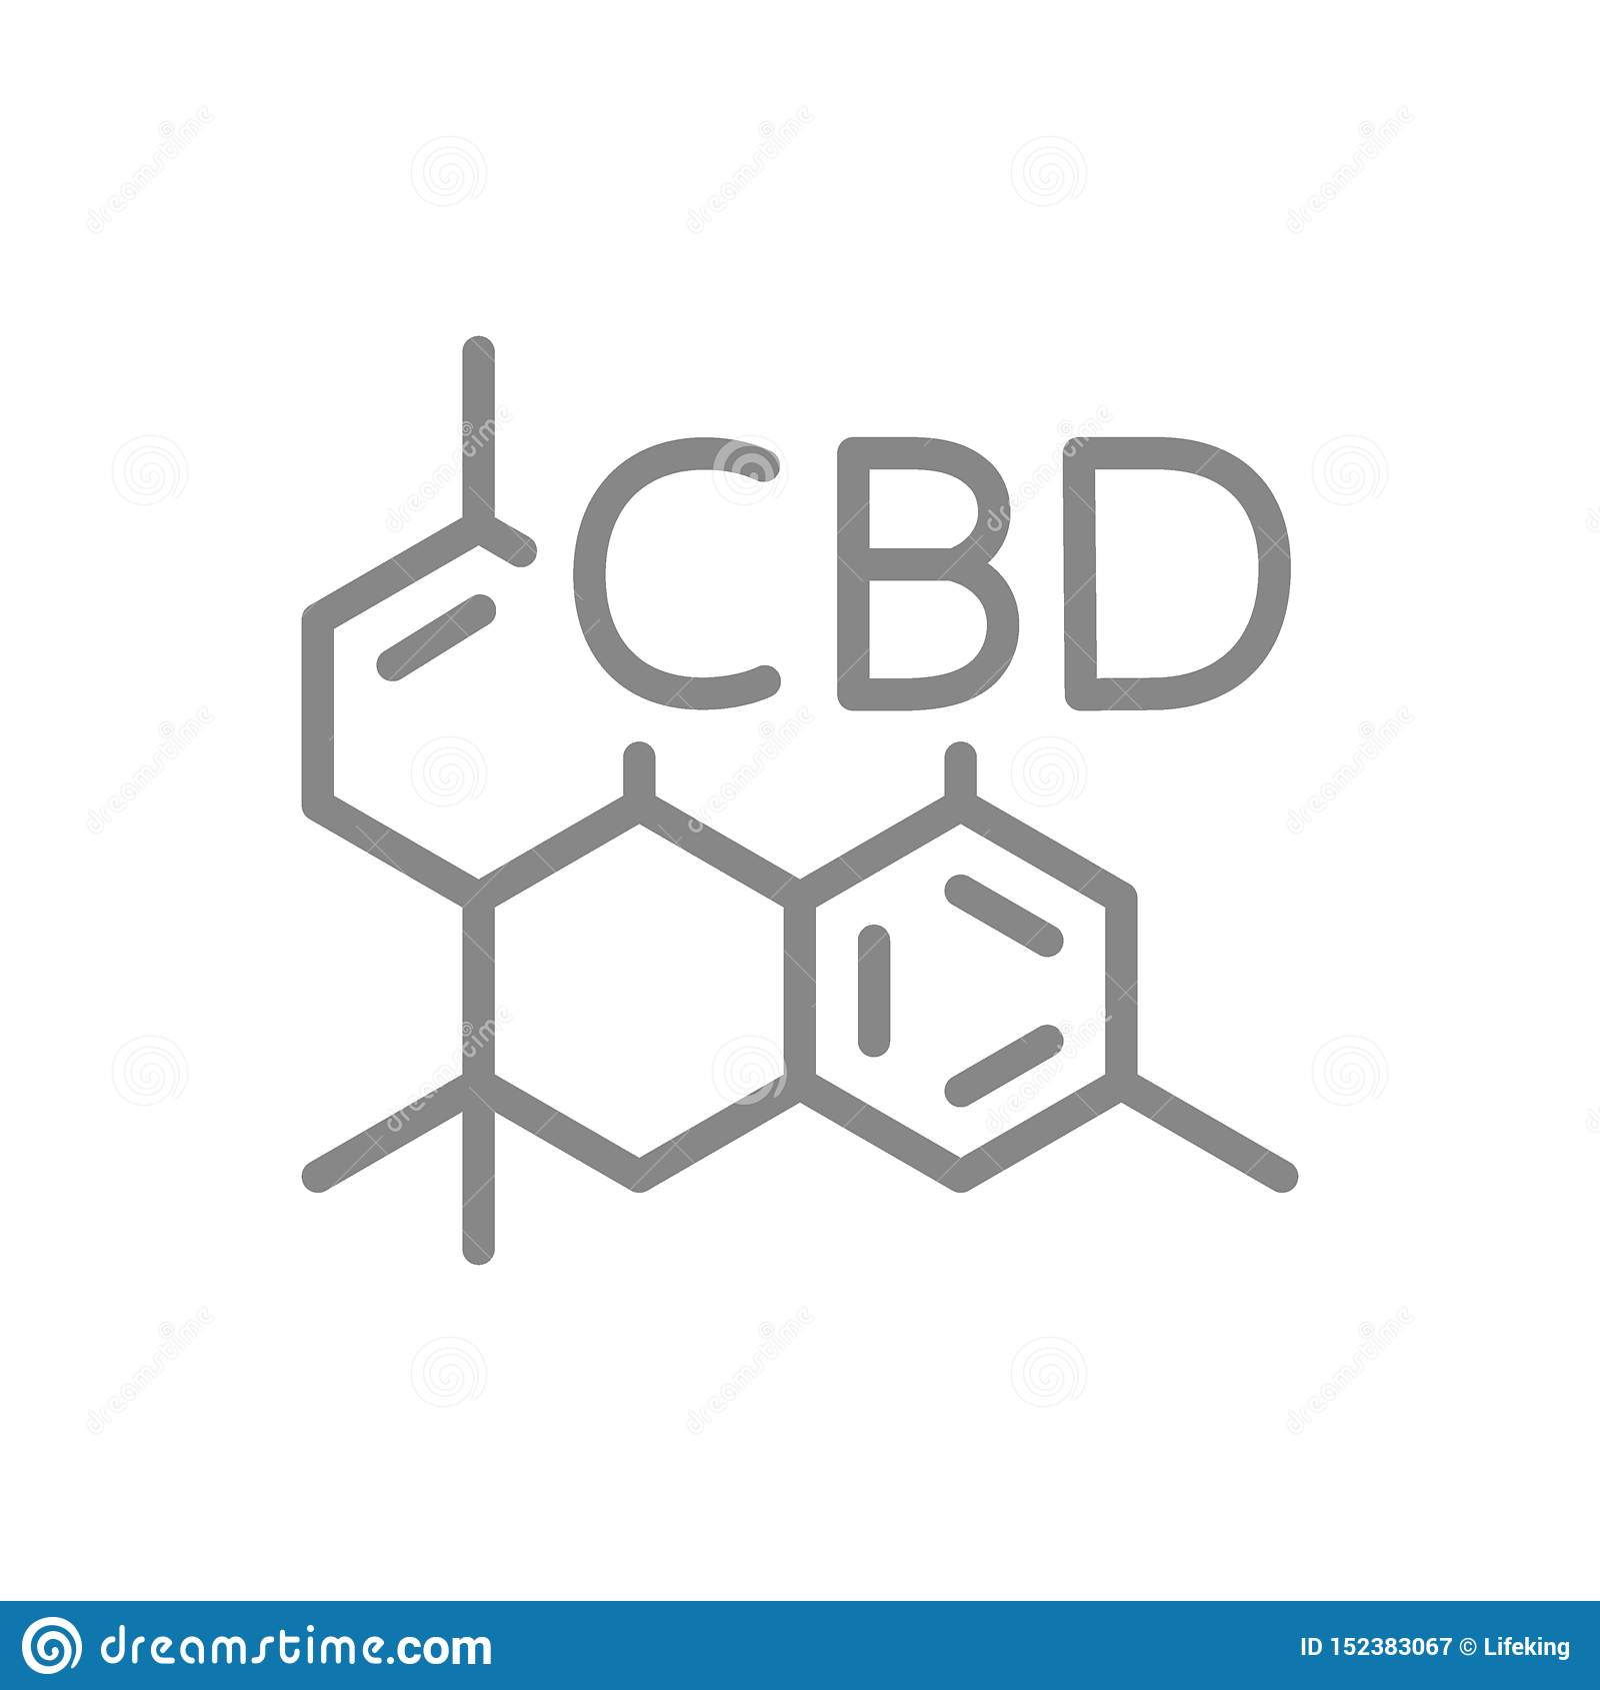 Fórmula molecular de CBD, línea icono de la estructura de la molécula del cannabidiol